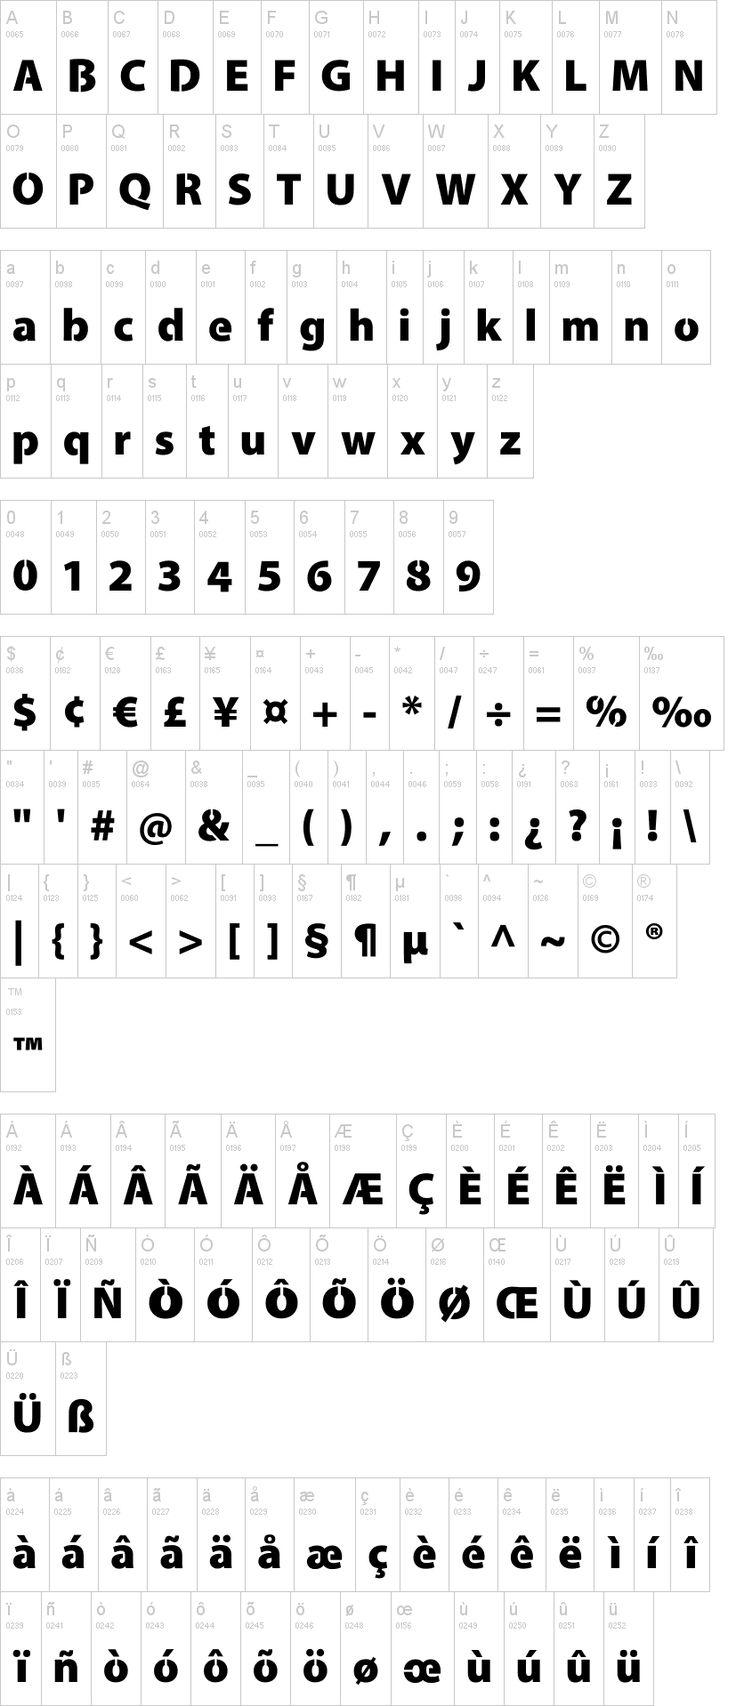 Cleanvertising Font Dafont, Free script